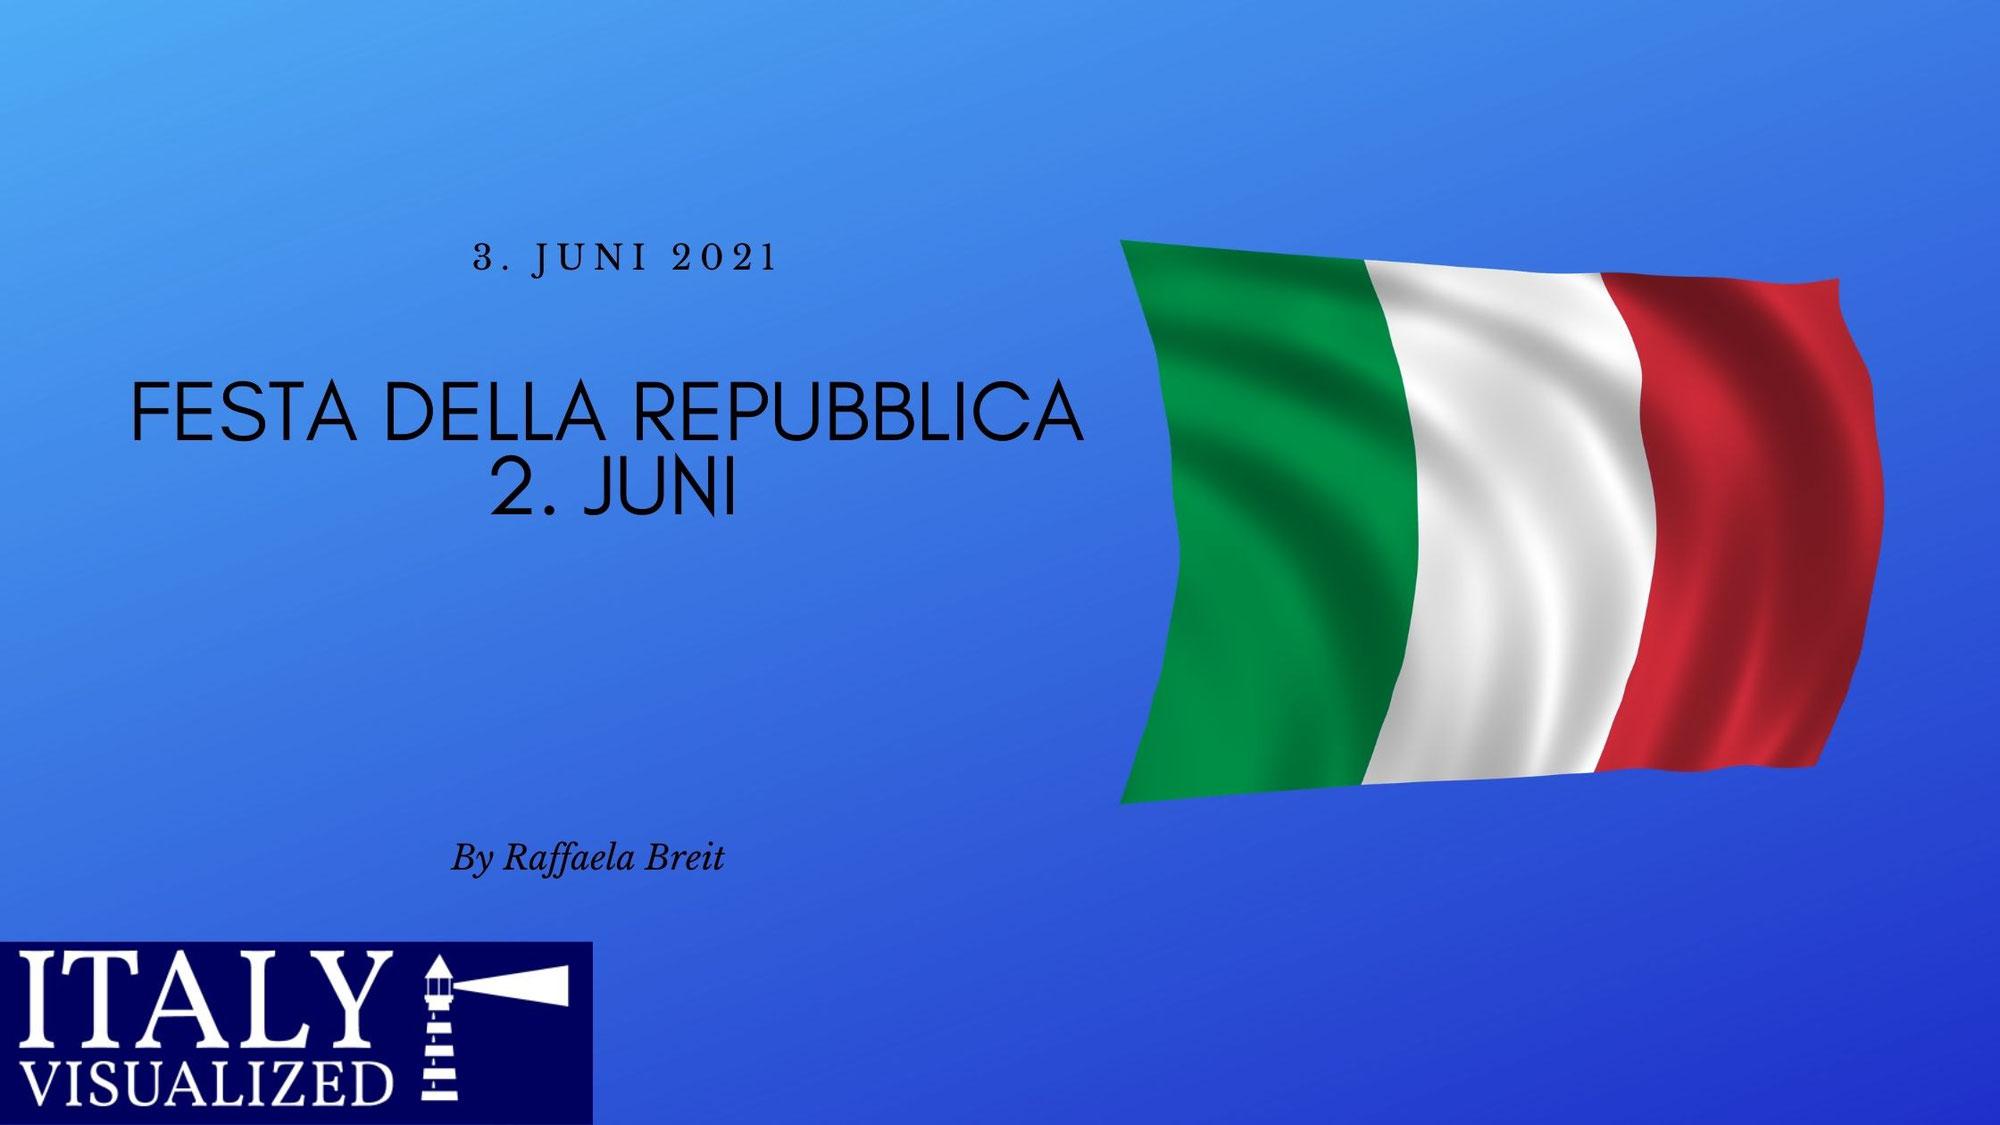 Festa della Repubblica – 2. Juni (Fest der Republik)